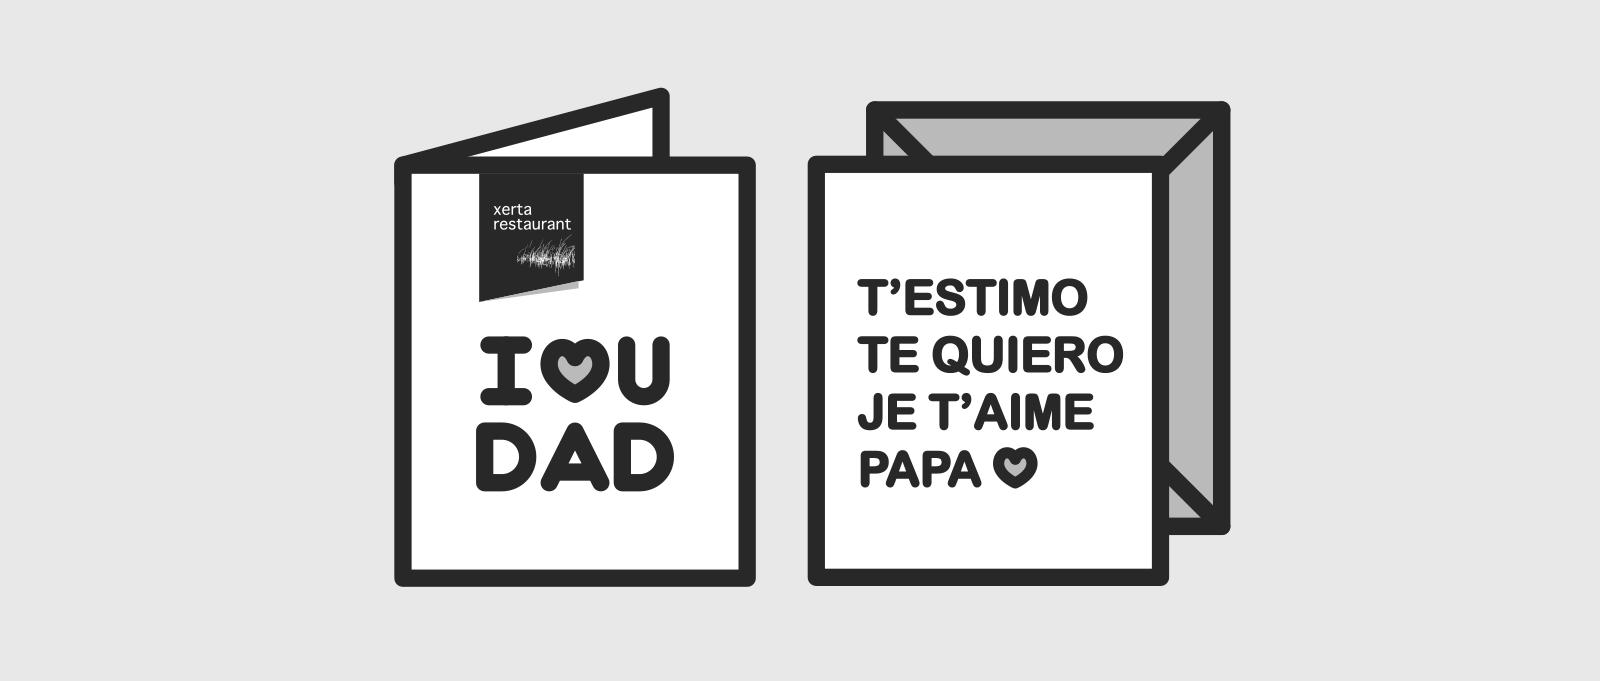 I❤U DAD - Father's Day in Barcelona - Xerta Restaurant